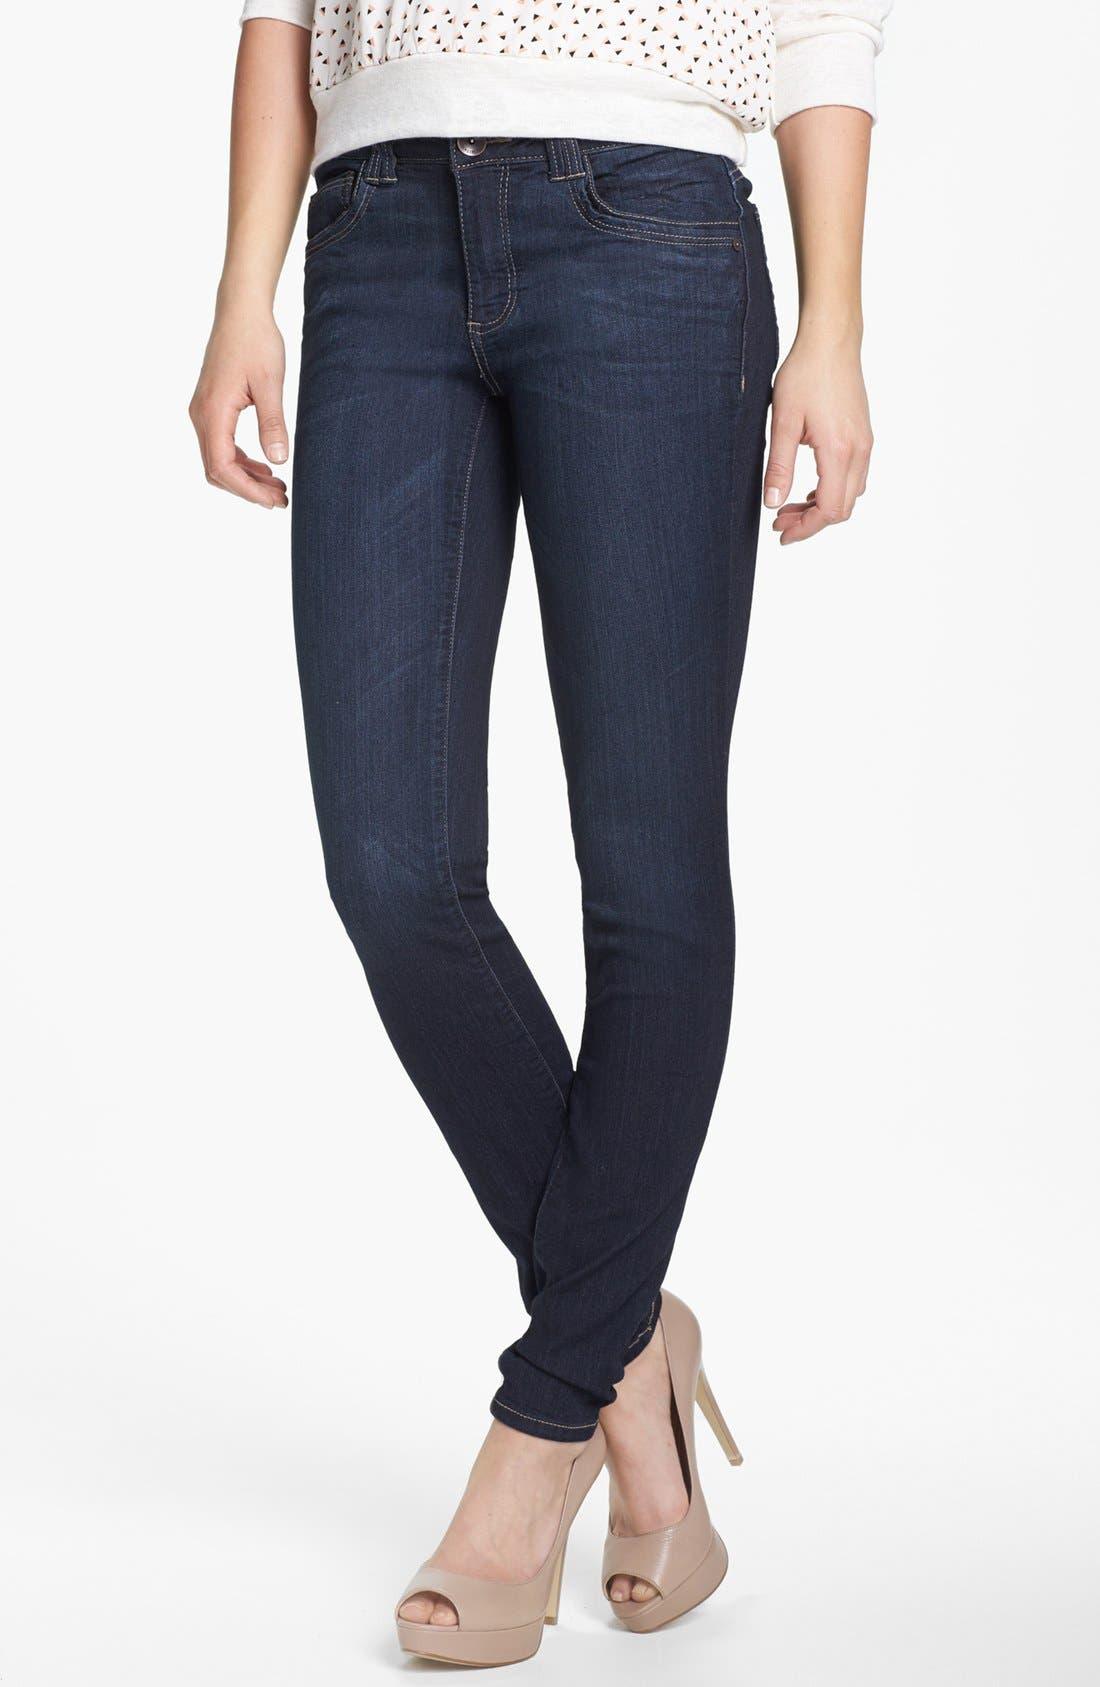 Alternate Image 1 Selected - Wit & Wisdom Skinny Jeans (Indigo) (Nordstrom Exclusive)